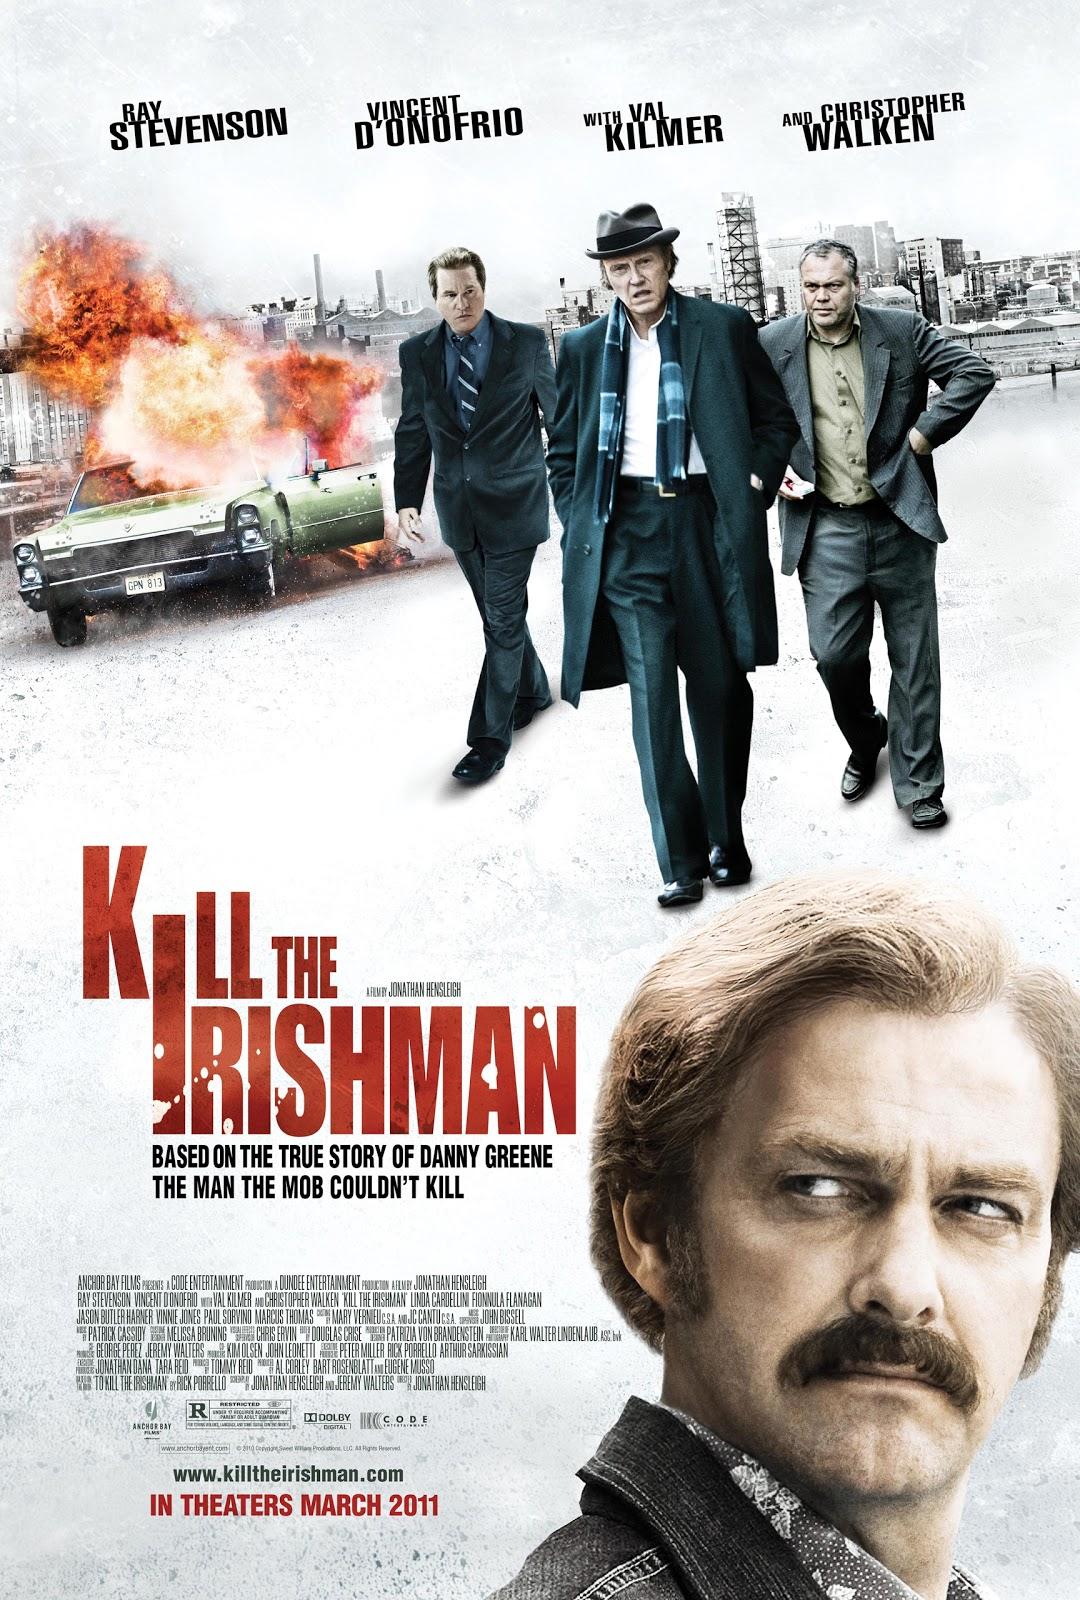 http://4.bp.blogspot.com/-9XCpasBePMg/TcpkM9uGUXI/AAAAAAAAAOs/JMmefHXW5Qo/s1600/kill_the_irishman_movie_poster_01.jpg